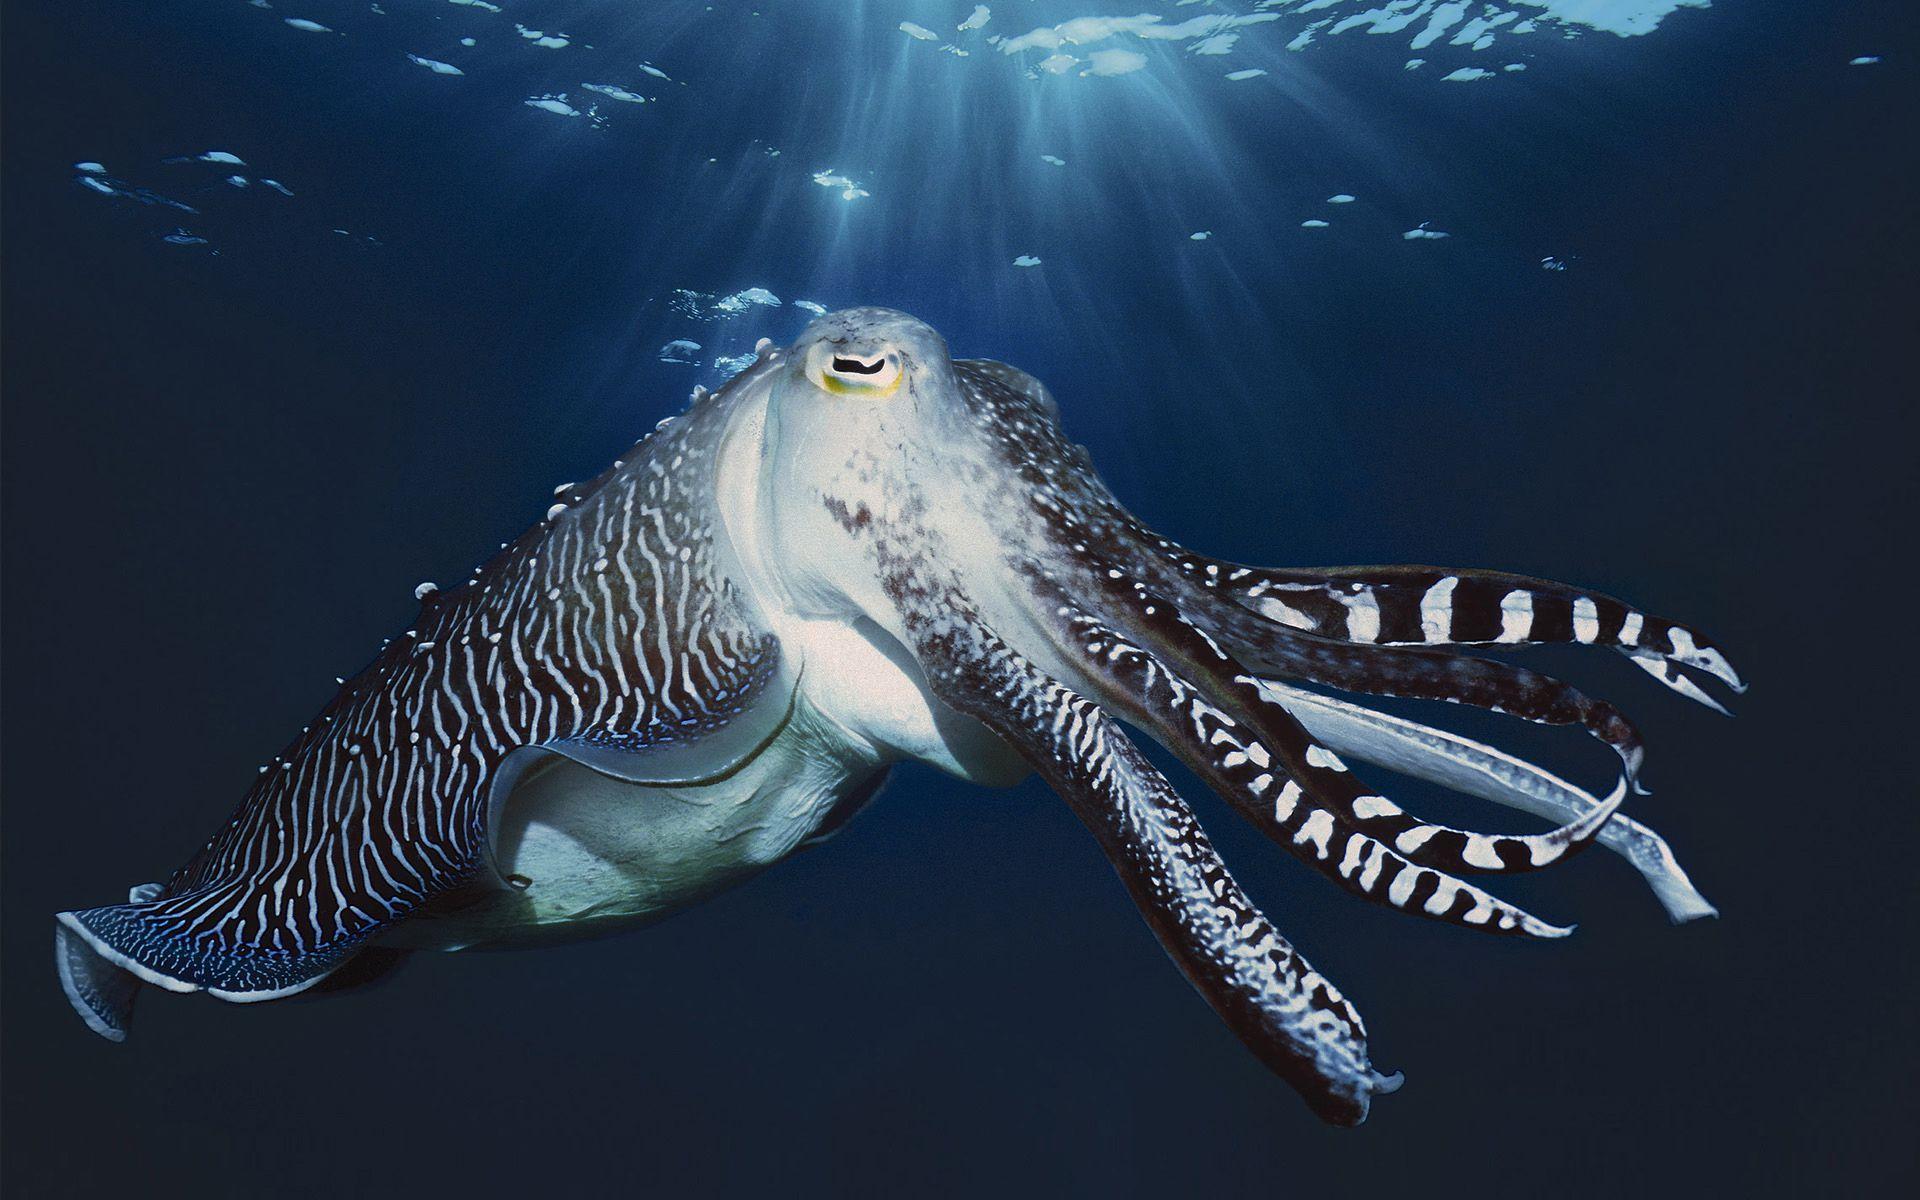 marine life definition - Google Search   Marine Life   Pinterest ...